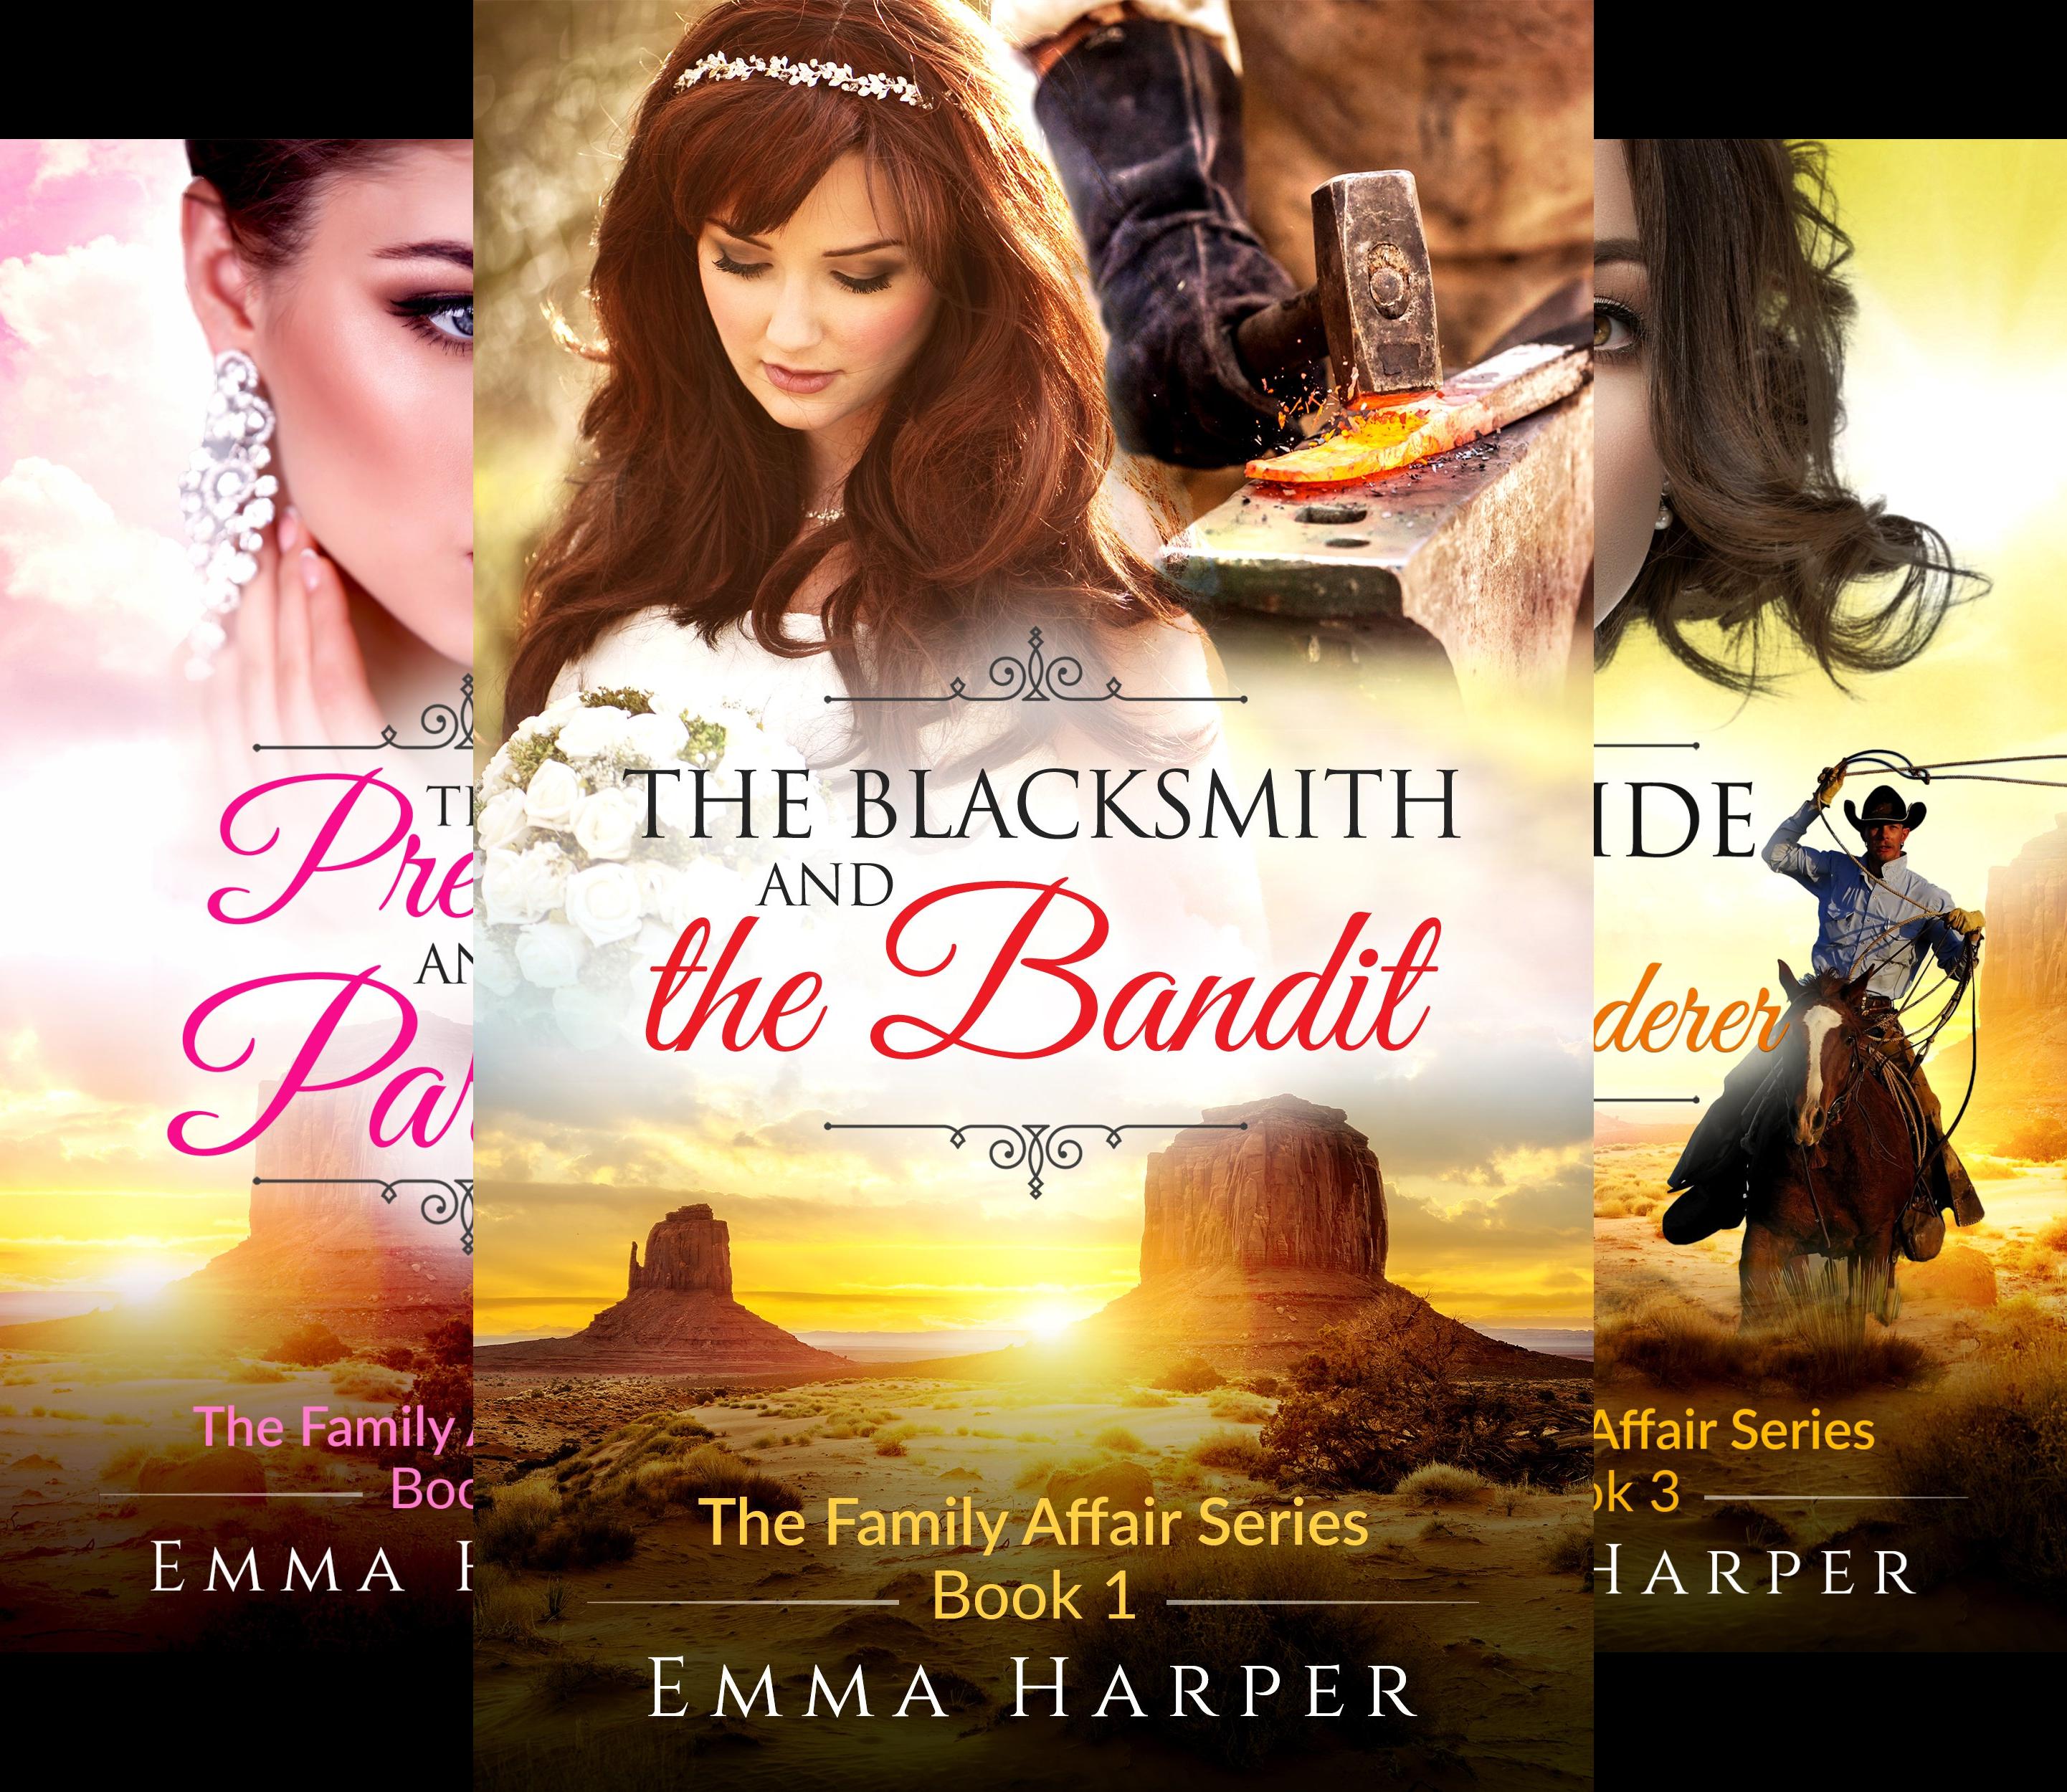 The Family Affair Series (3 Book Series)